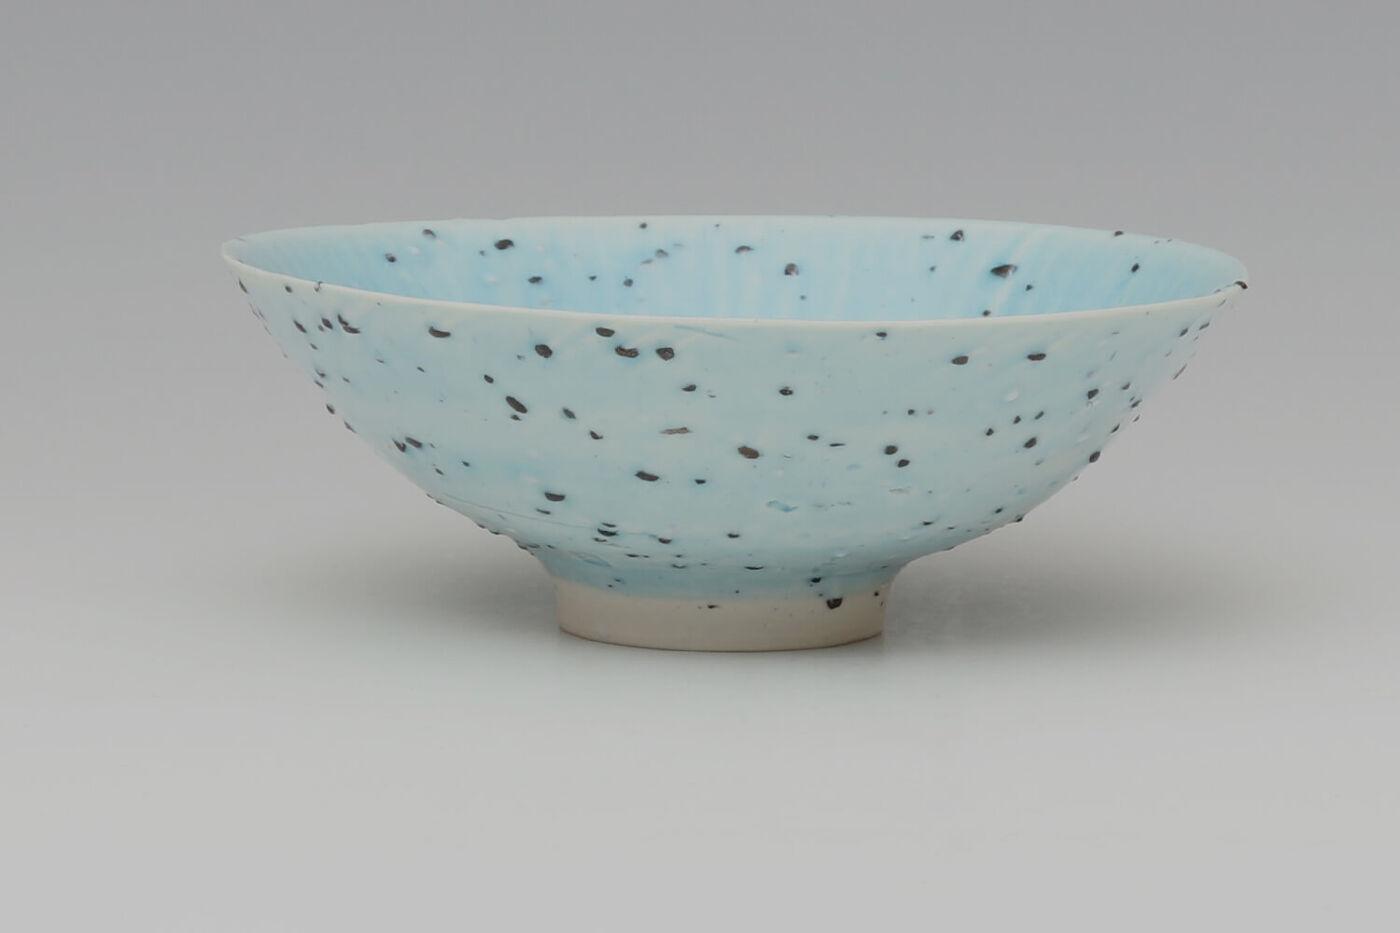 Peter Wills Ceramic Pale Blue River Grogged Porcelain Bowl 194